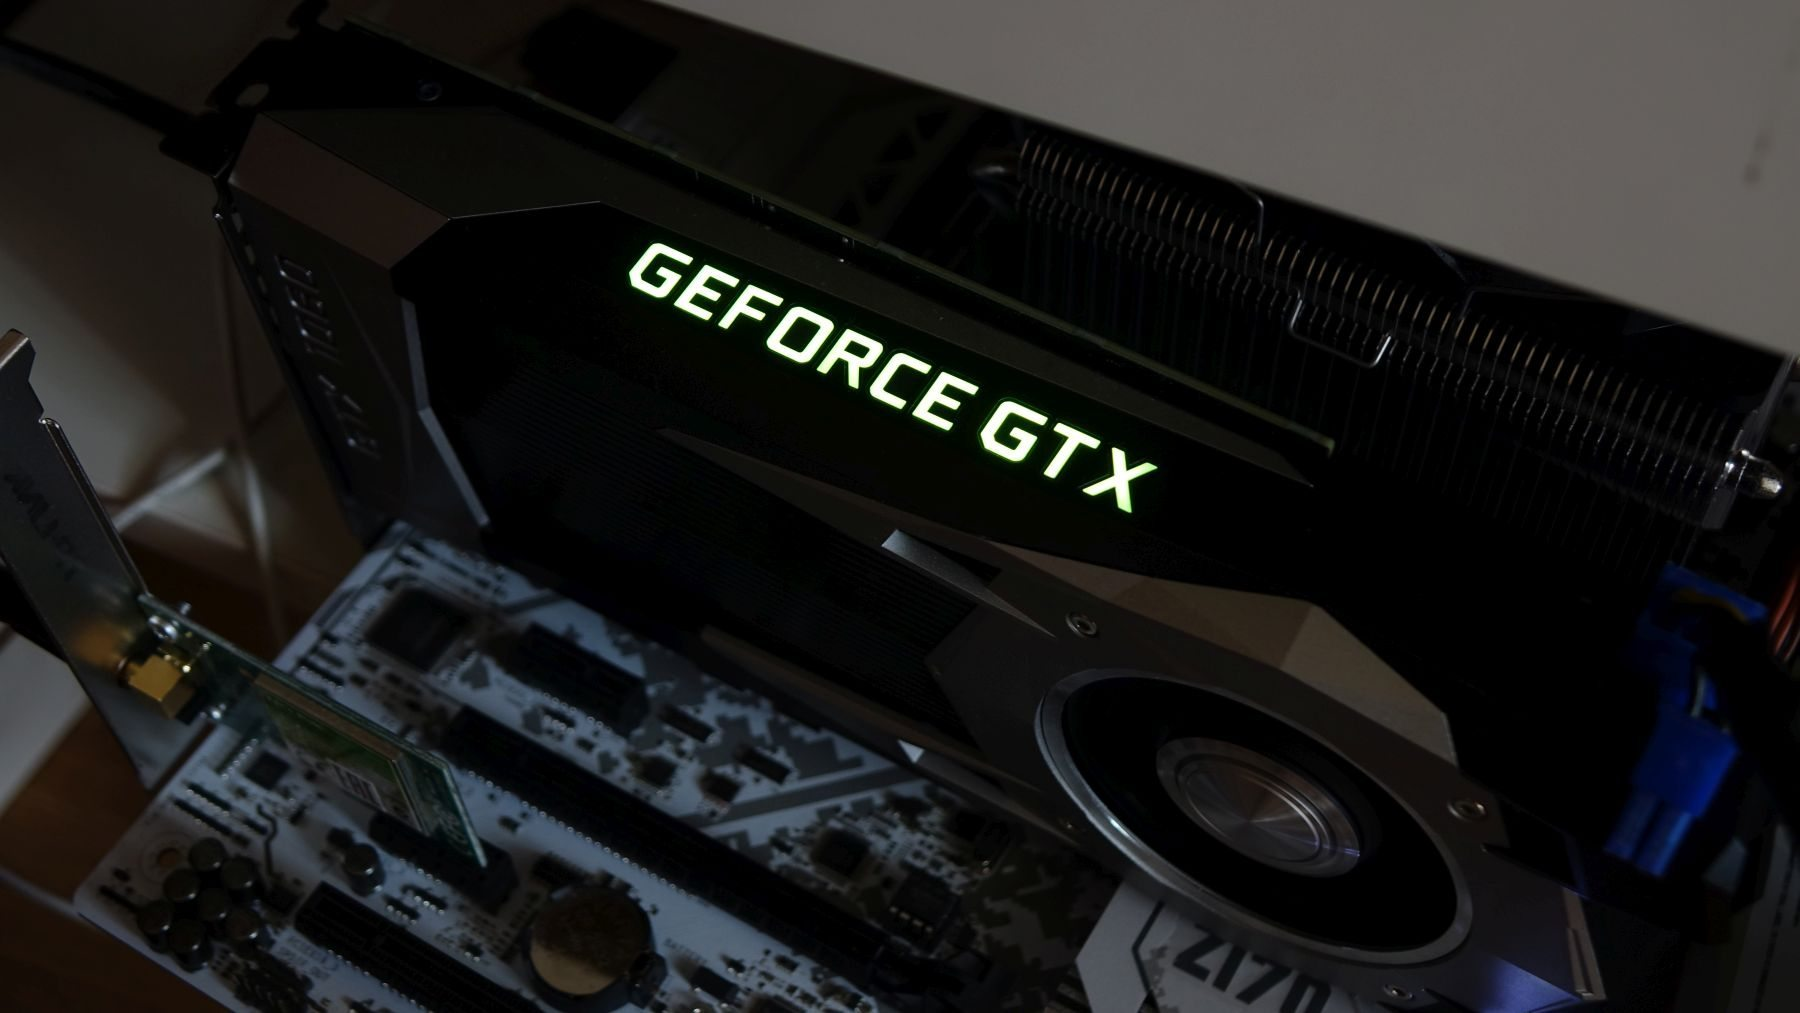 GeForce GTX 1060 подсветка